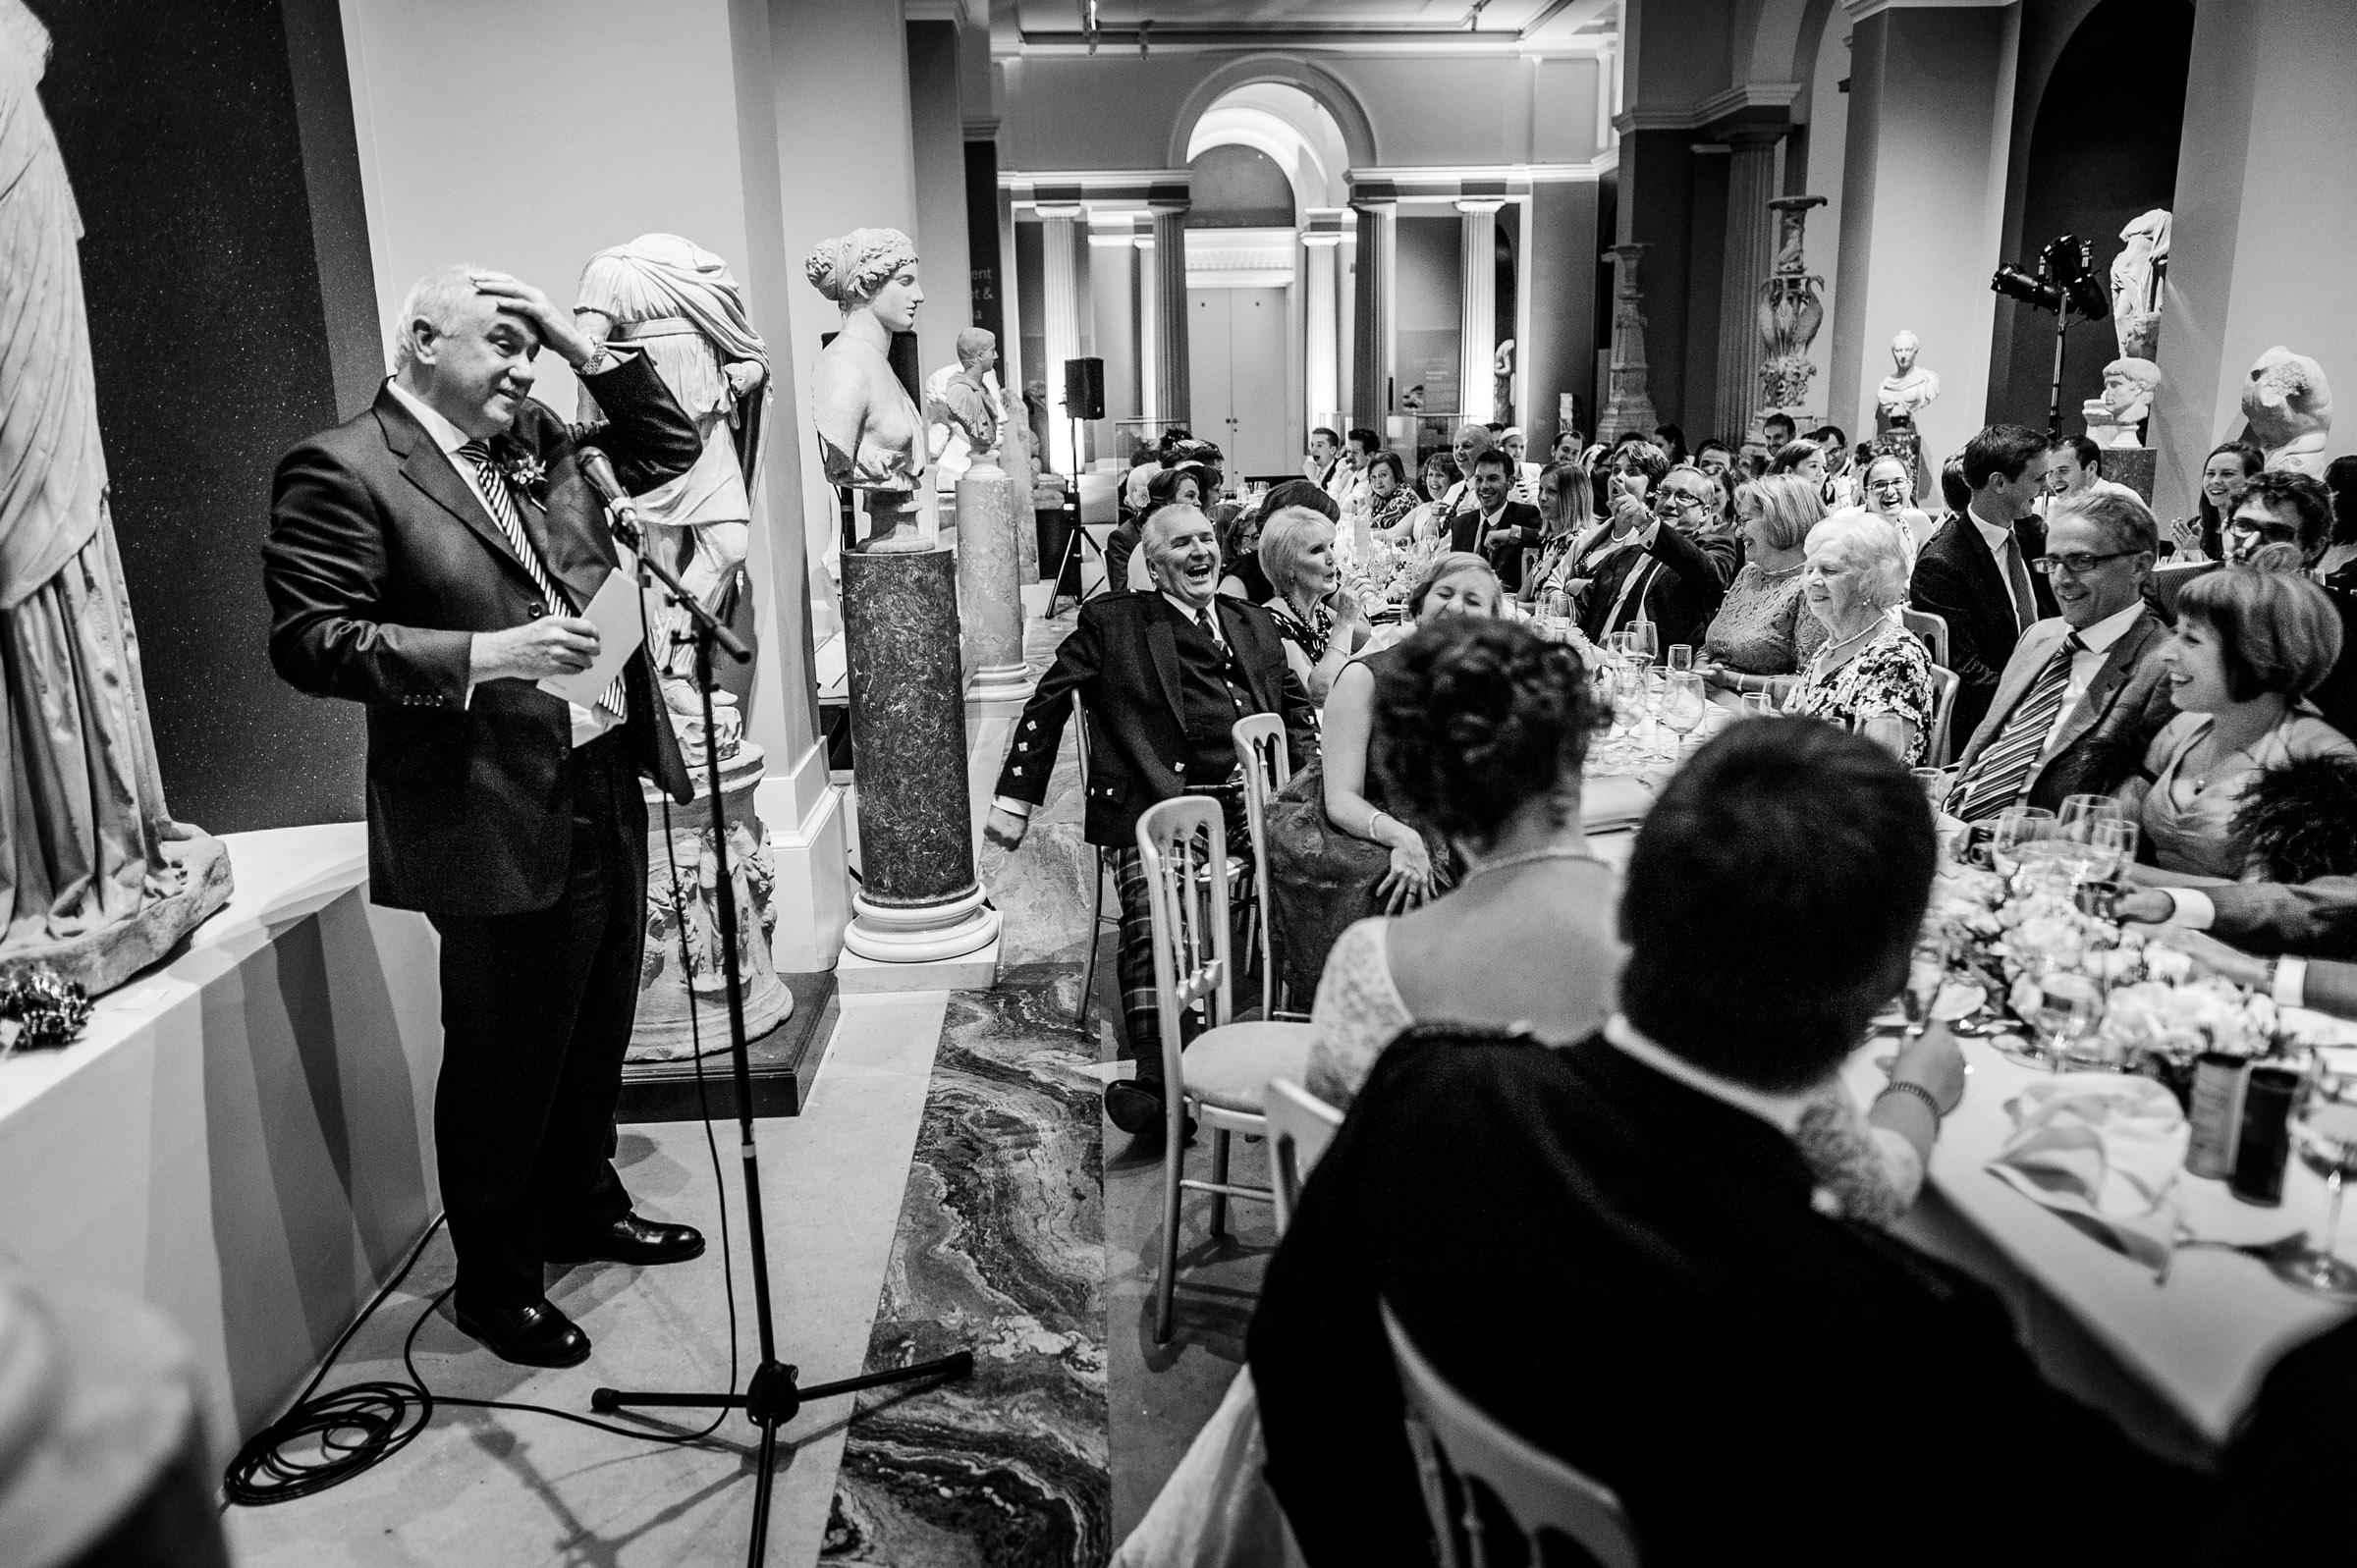 Ashmolean-Museum-Wedding-Pictures-0061.jpg